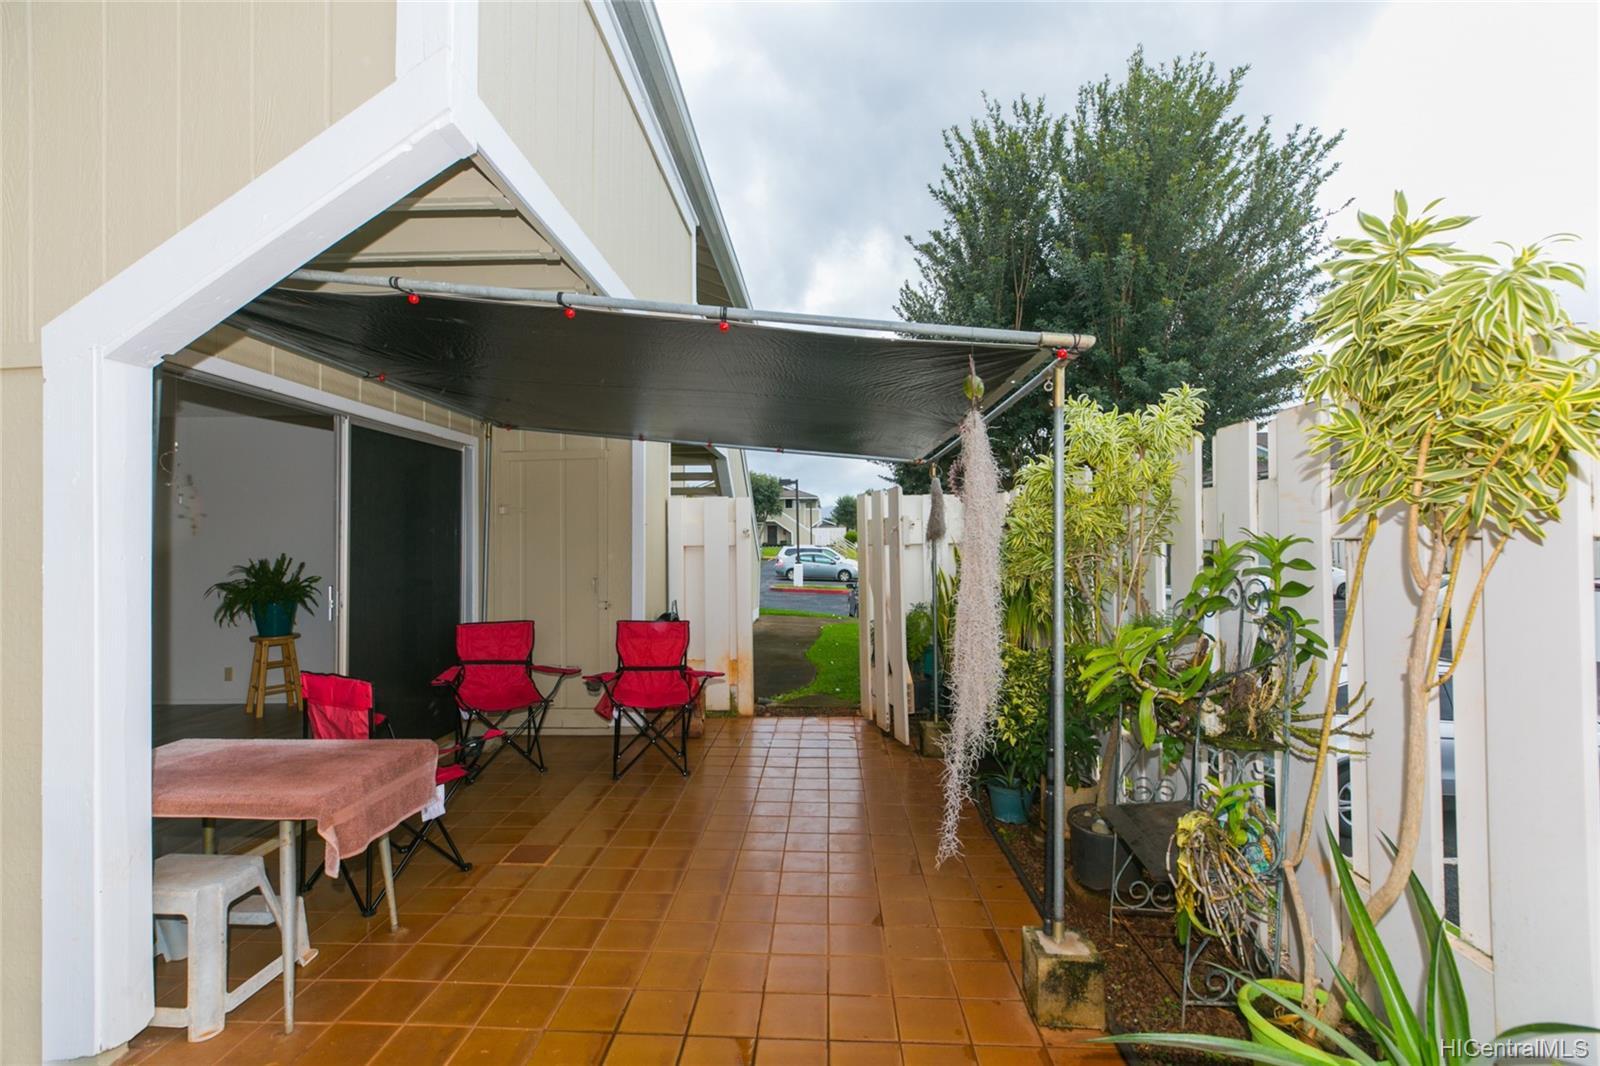 94-724 Paaono Street townhouse # Y2, Waipahu, Hawaii - photo 20 of 24